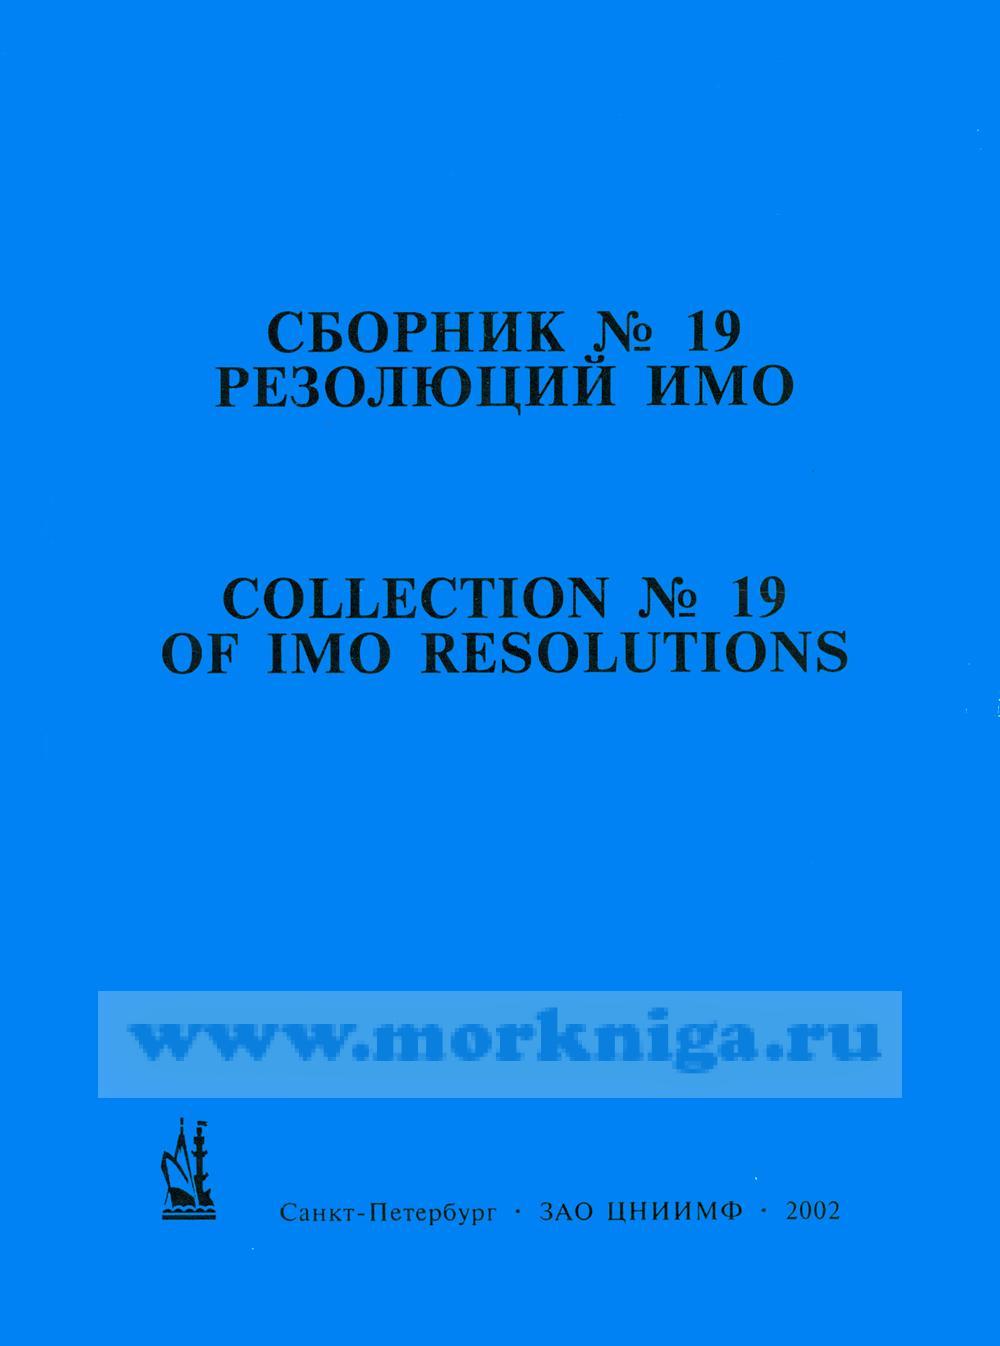 Сборник № 19 резолюций ИМО. Collection No.19 of  IMO Resolutions